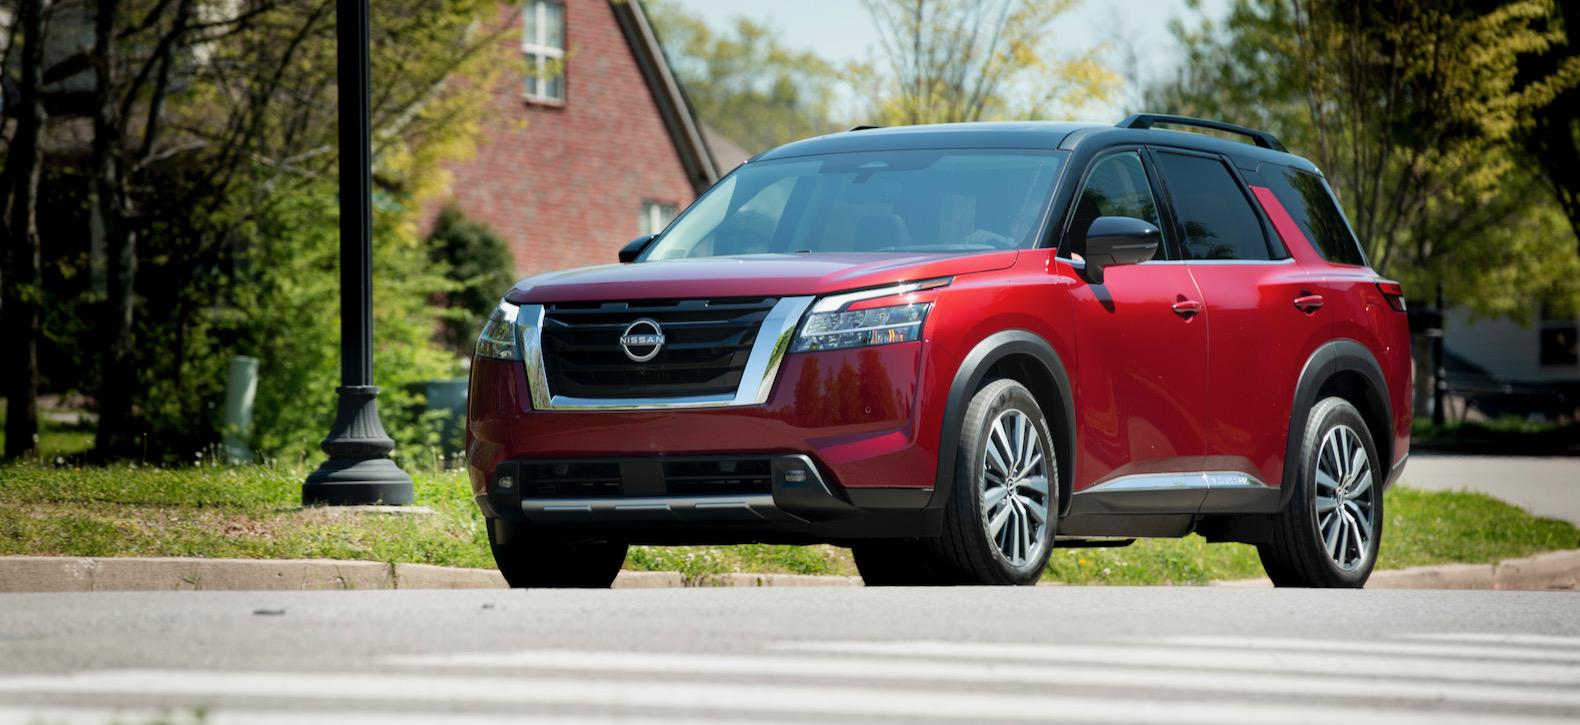 2022 Nissan Pathfinder Production